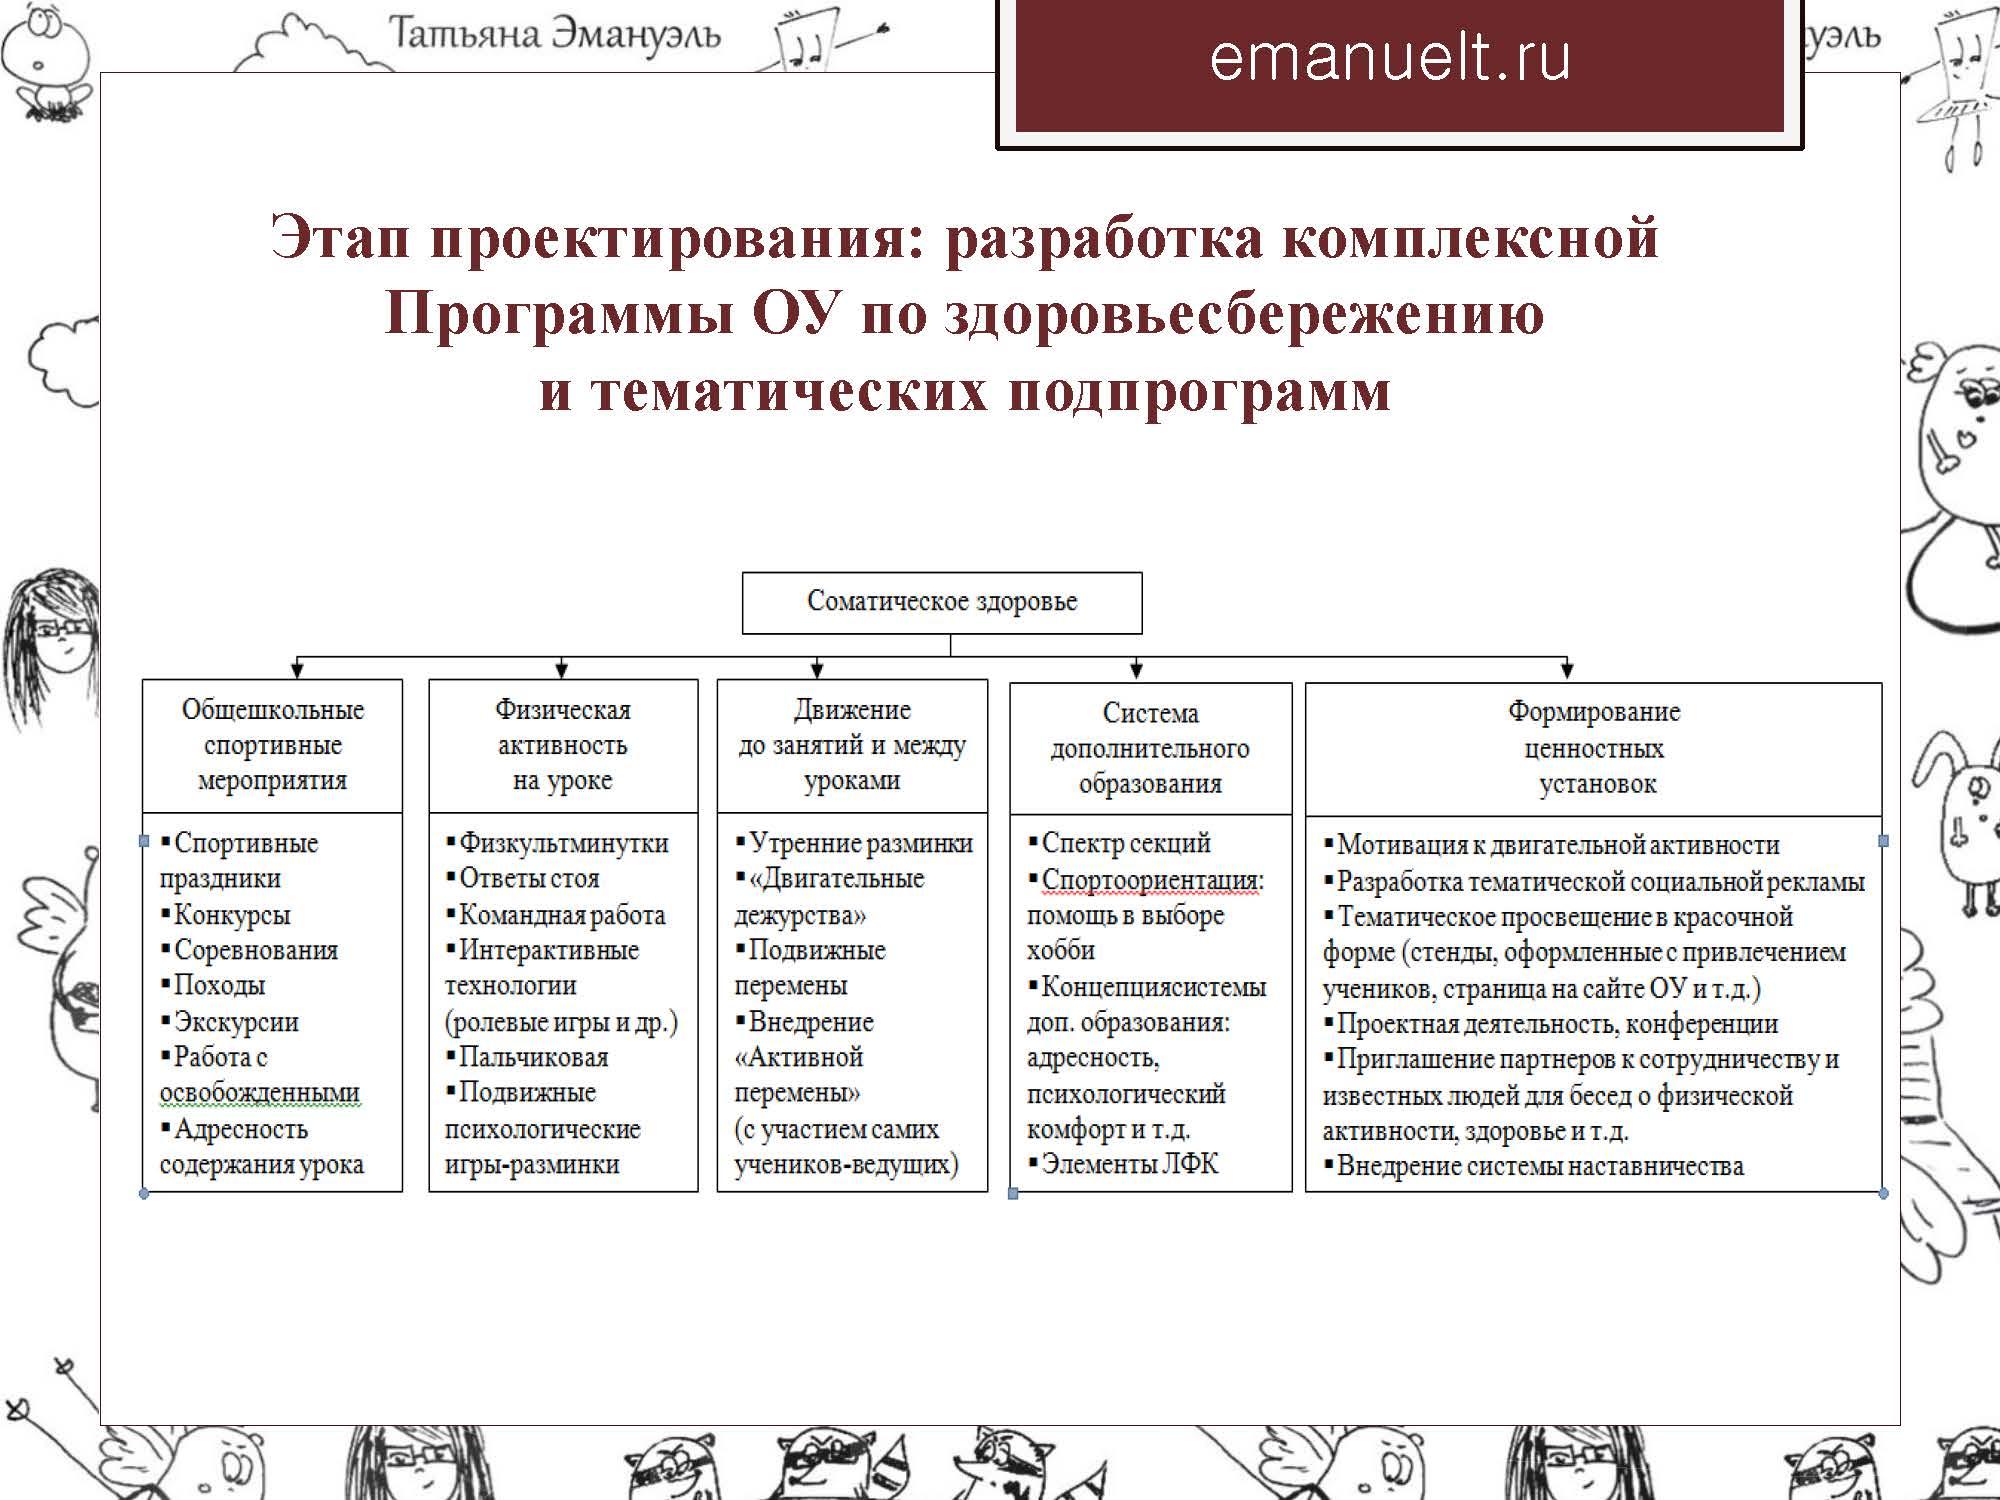 06 февраля эмануэль_Страница_069